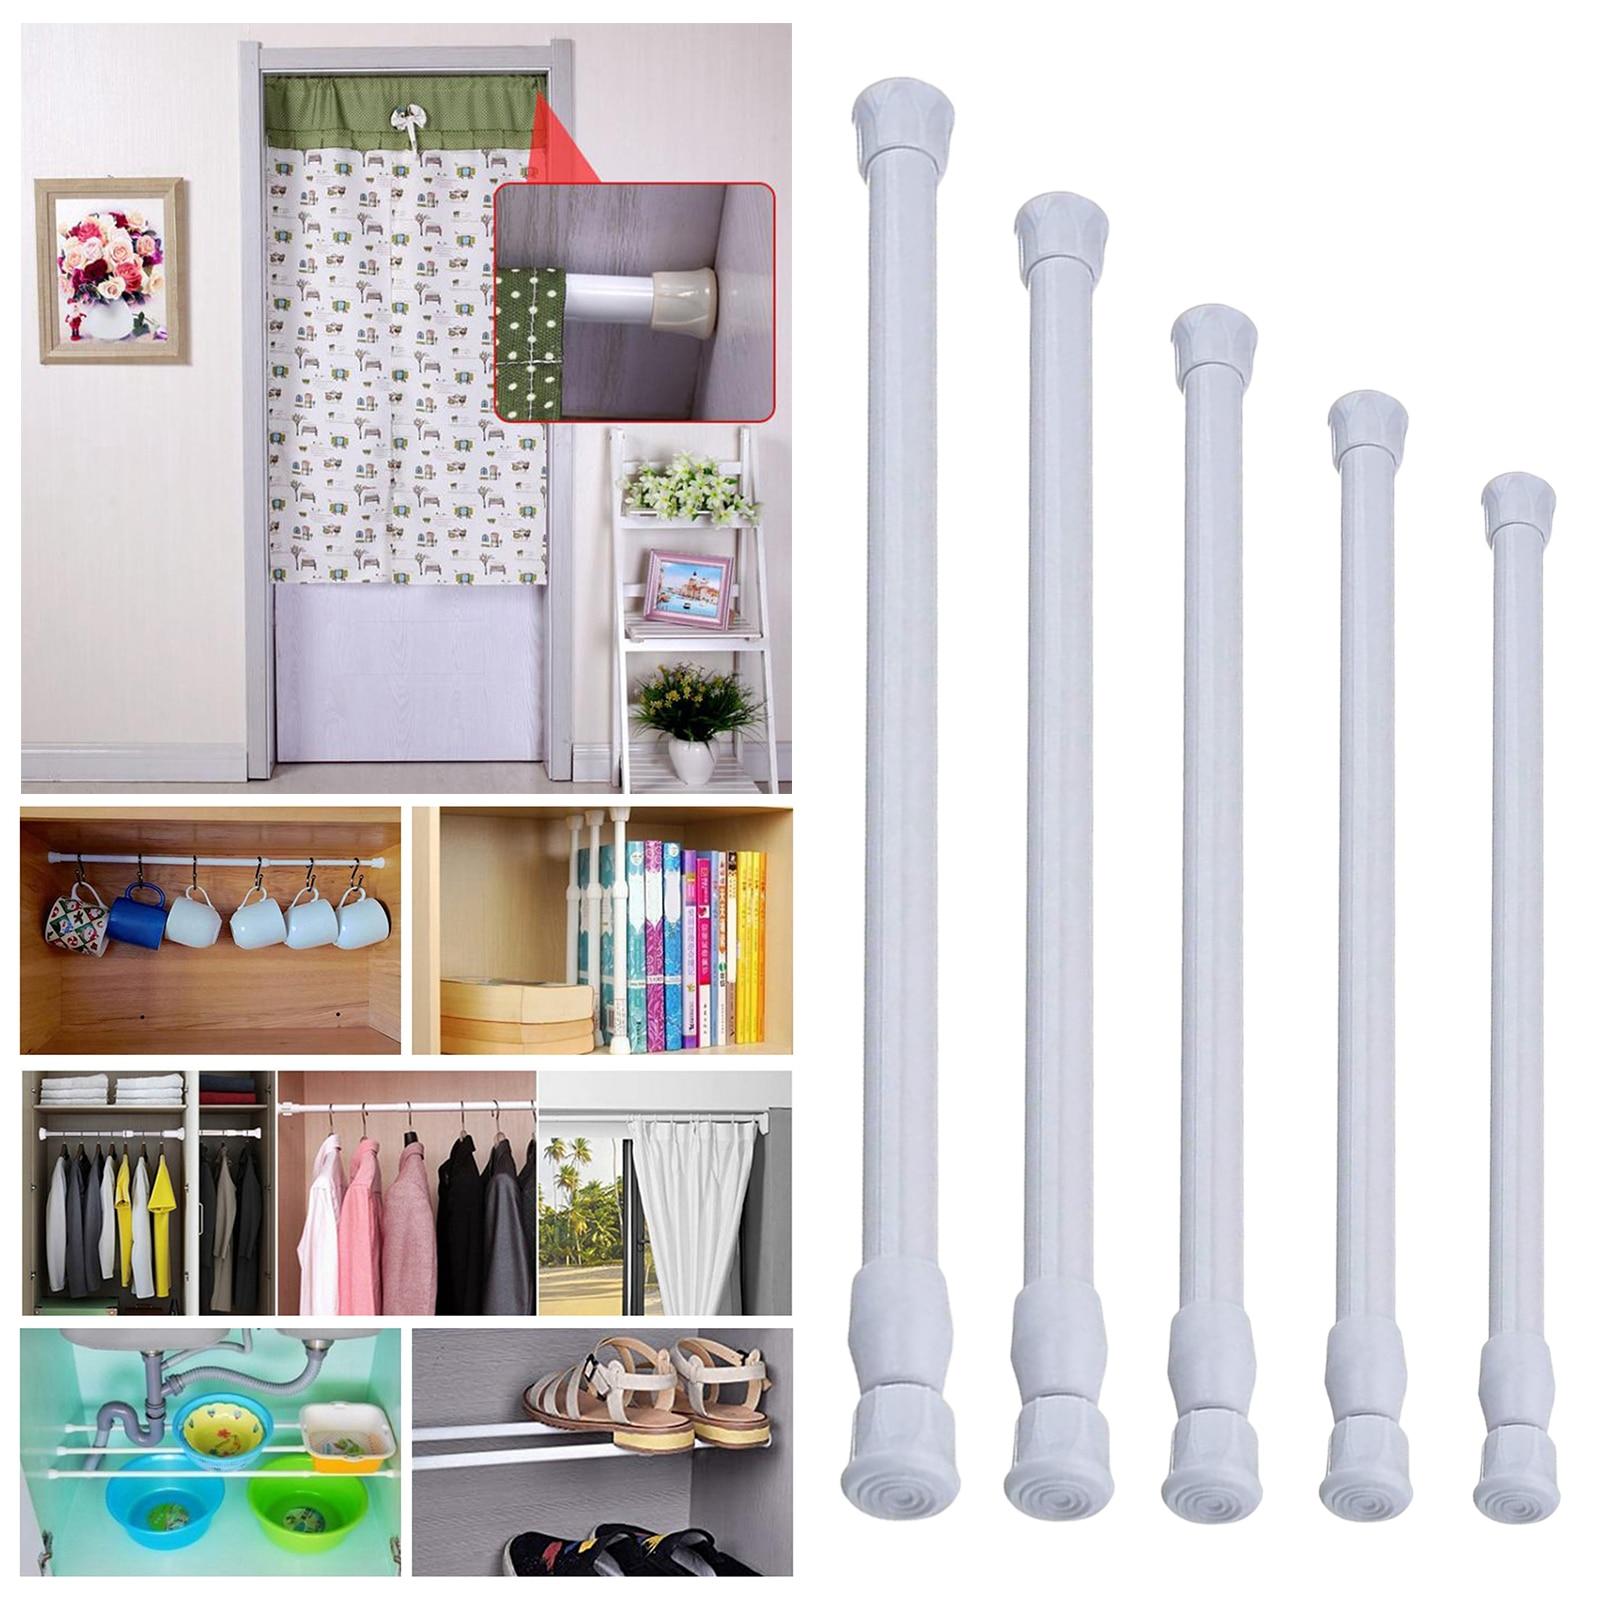 1pc Spring Curtain Short Tension Rods Bar Hanger Rods for Bathroom Shower Cupboard Window Closet Bookshelf